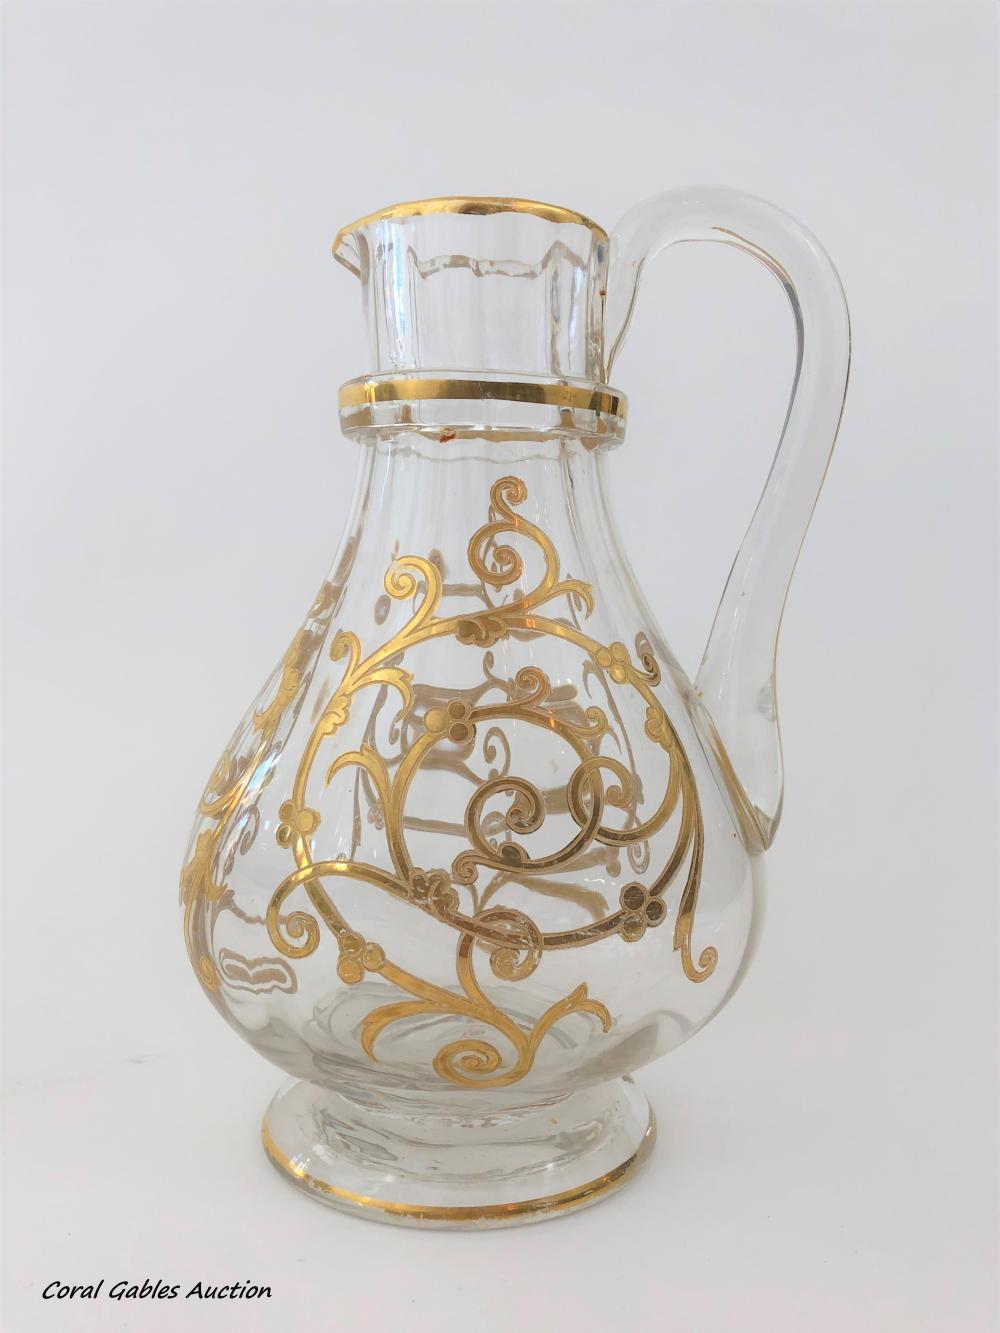 Antique baccarat-style jug